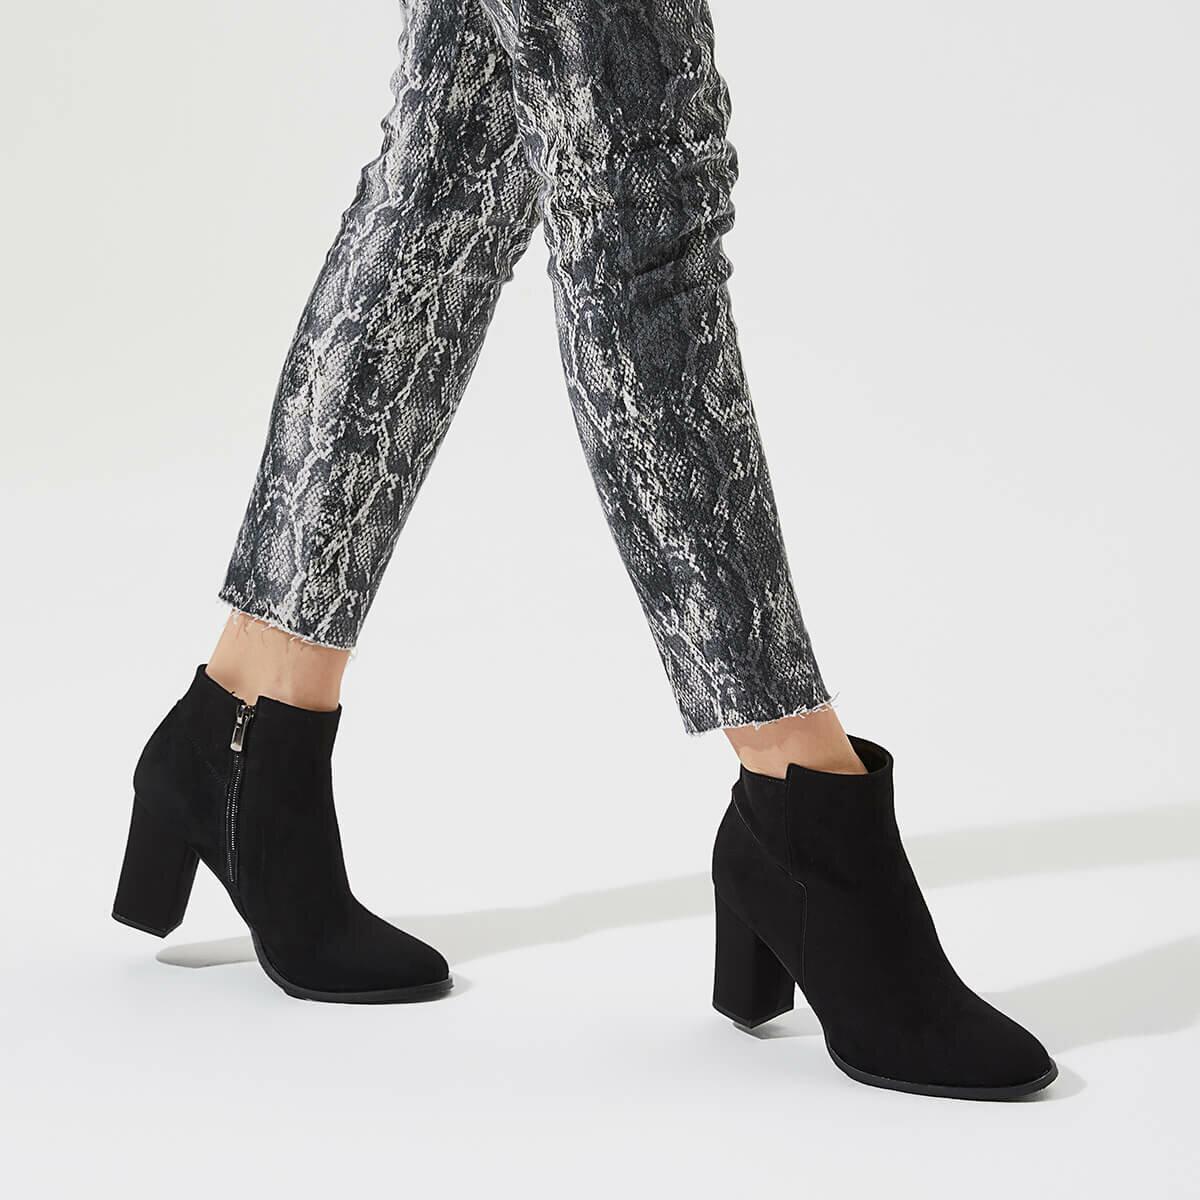 FLO WOODBINE85Z SUET Black Women Boots BUTIGO